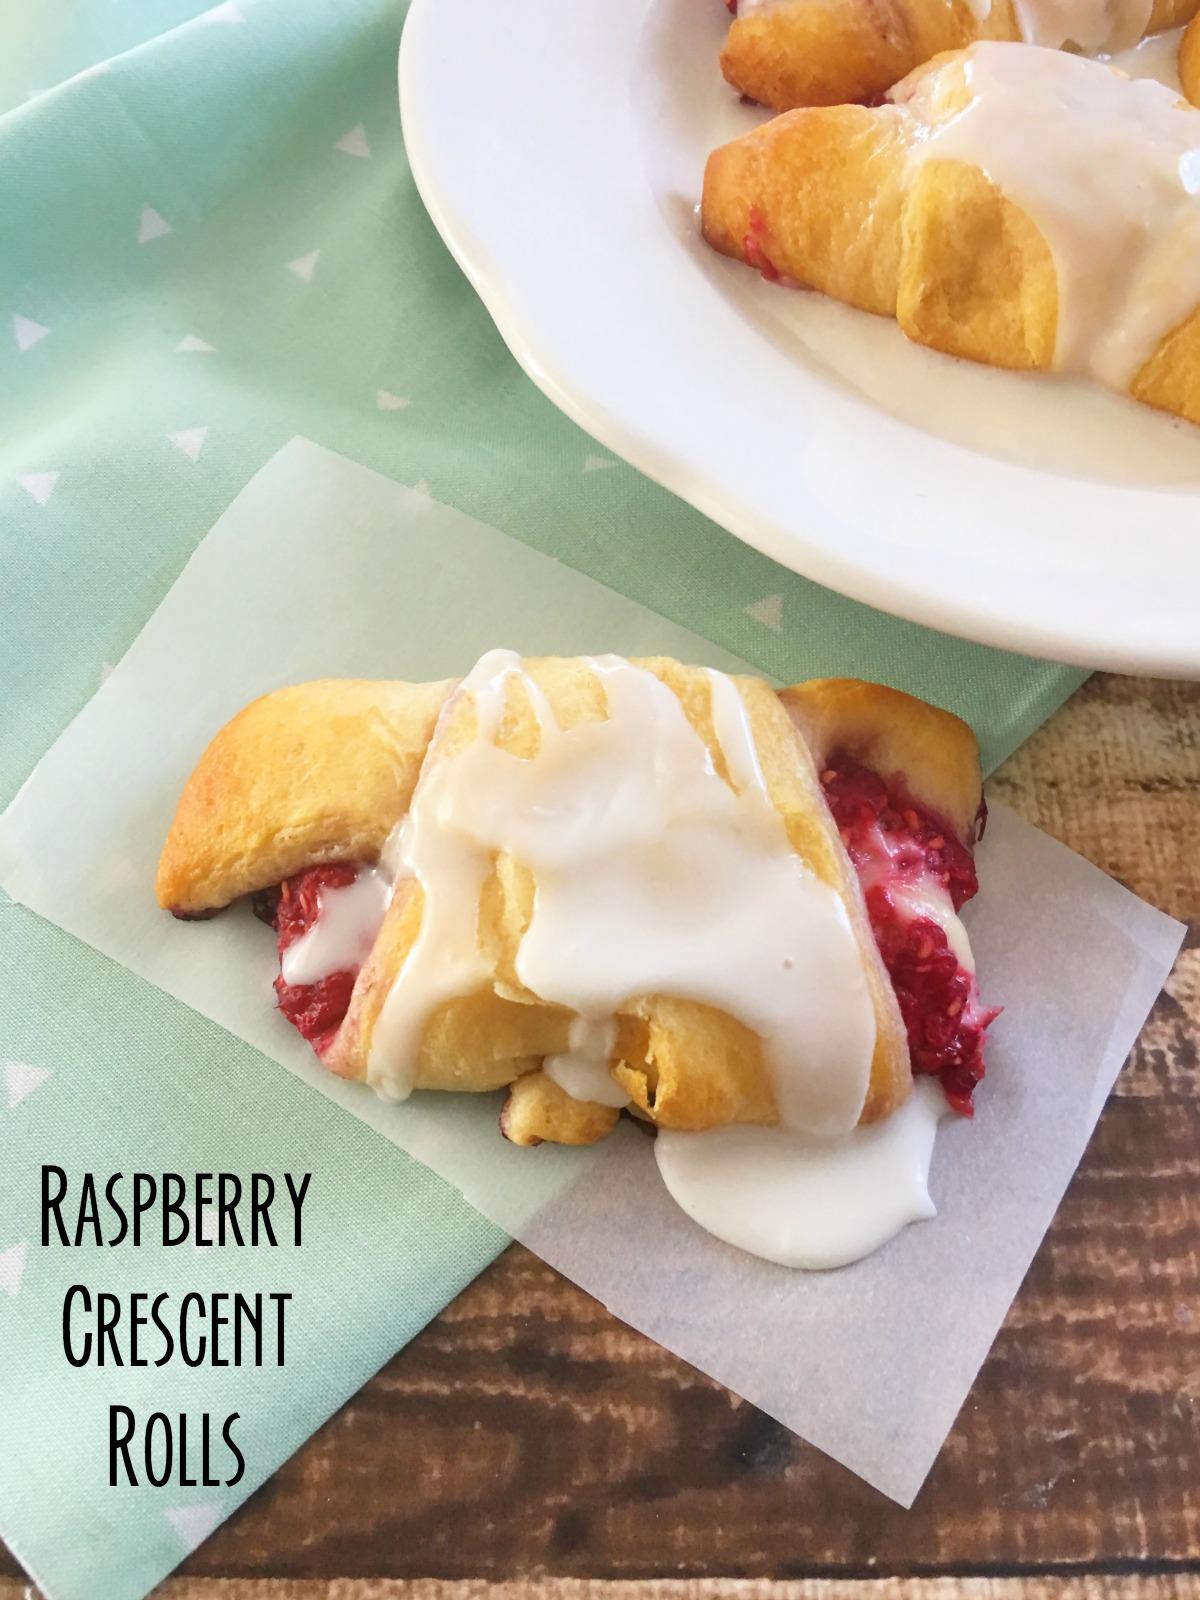 Raspberry Crescent Rolls